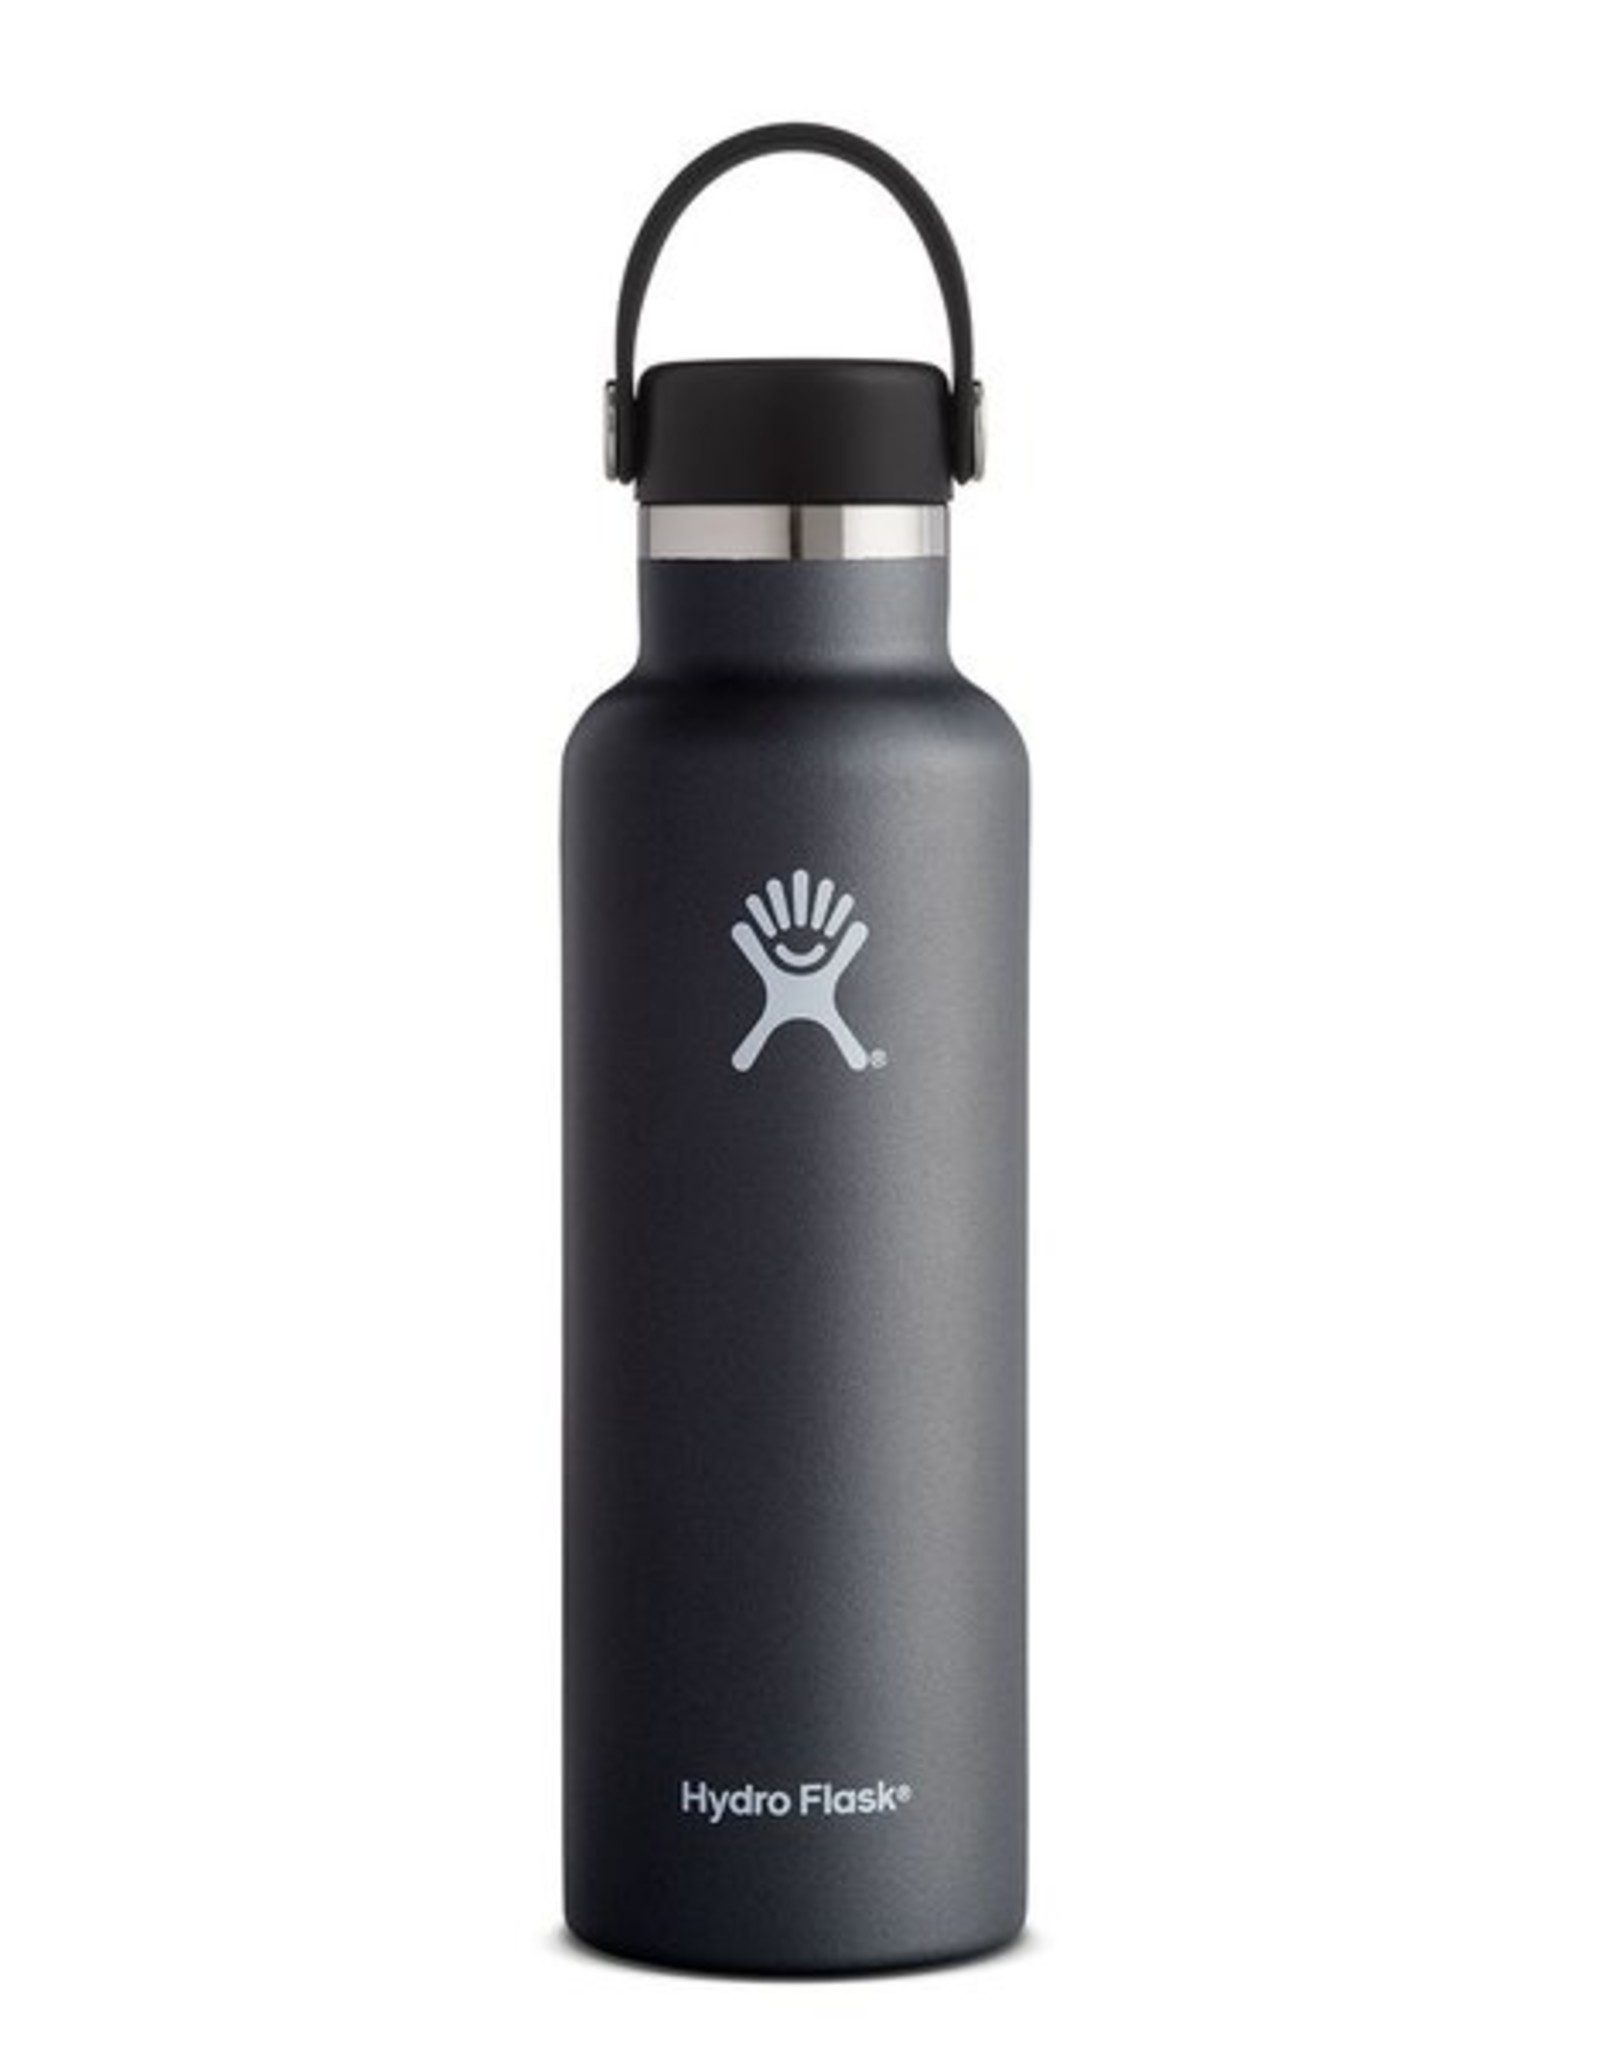 Hydro Flask Hydro Flask - 21 OZ. STANDARD MOUTH